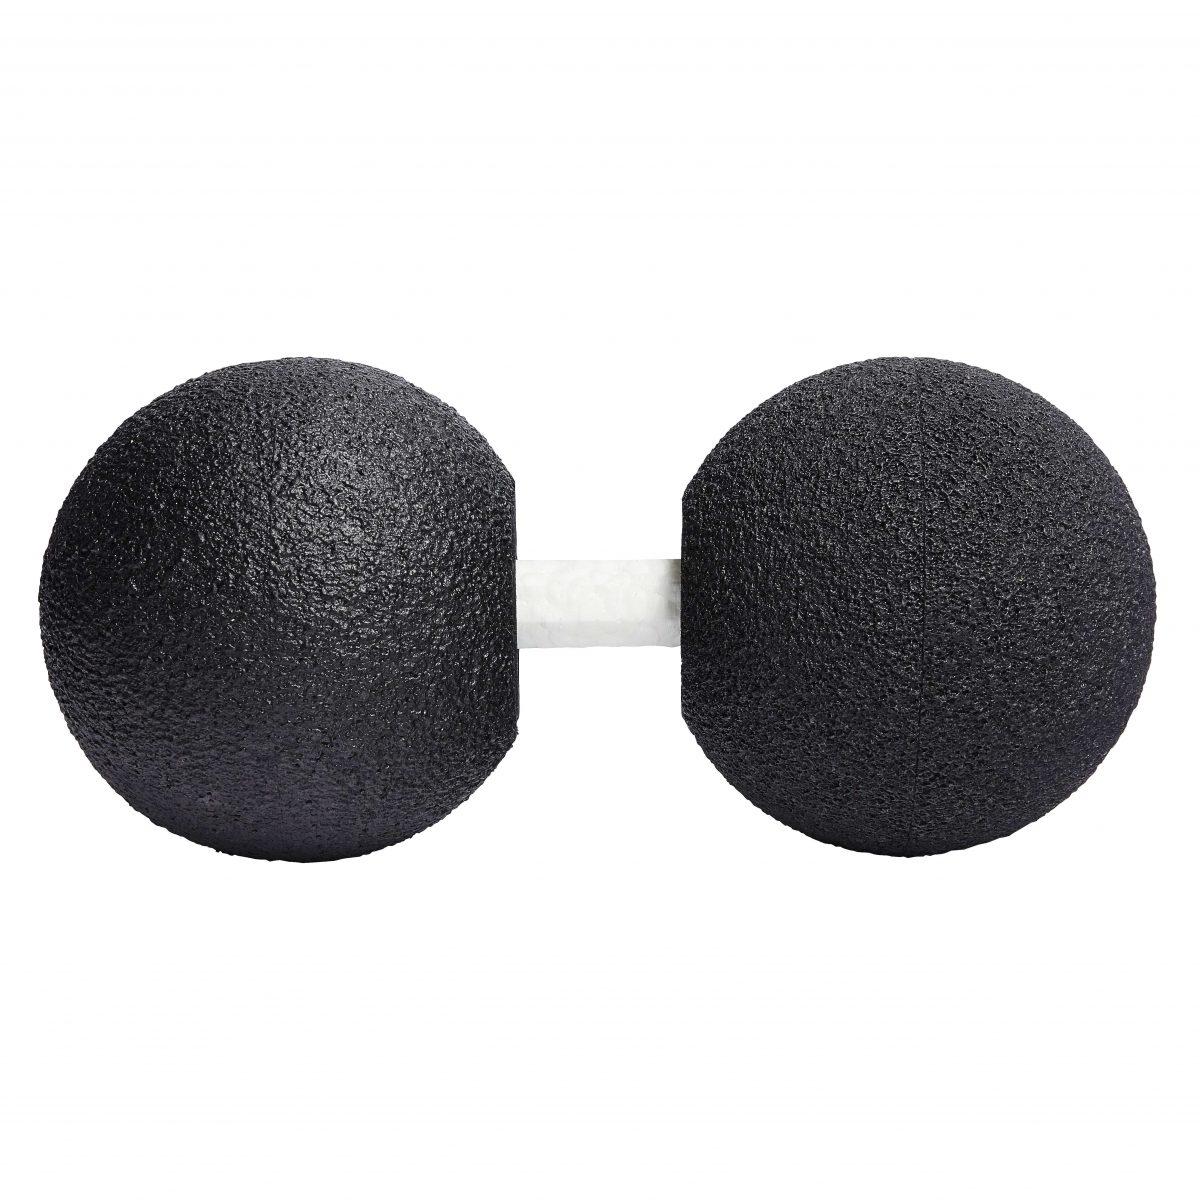 "Blackroll Faszienball ""Duoflex 12"" - Fitnessgeräte - Blackroll"